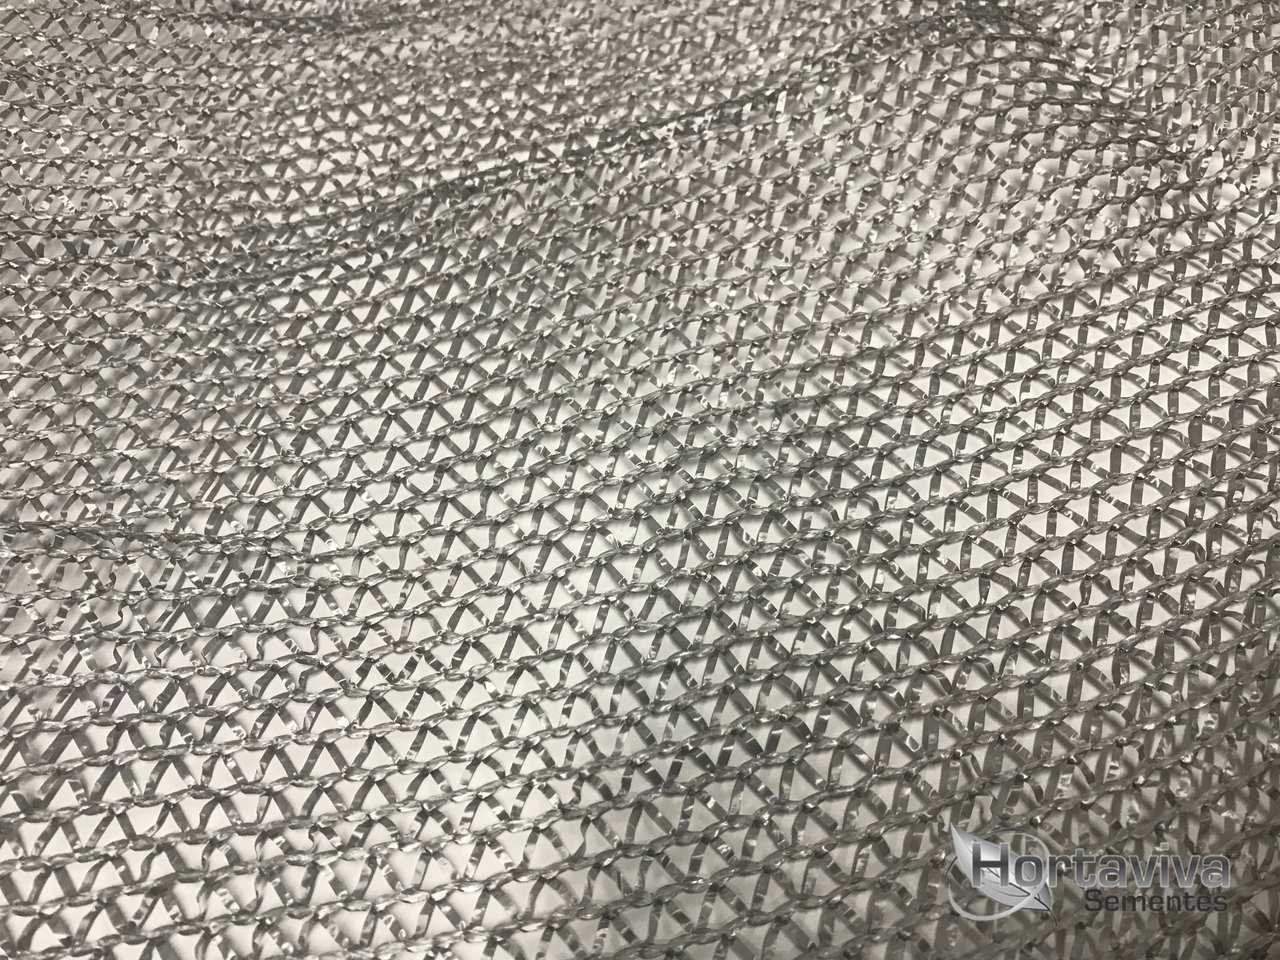 Tela de Sombreamento Prata Termo Refletora Freshnet 50% - Largura: 2 Metros